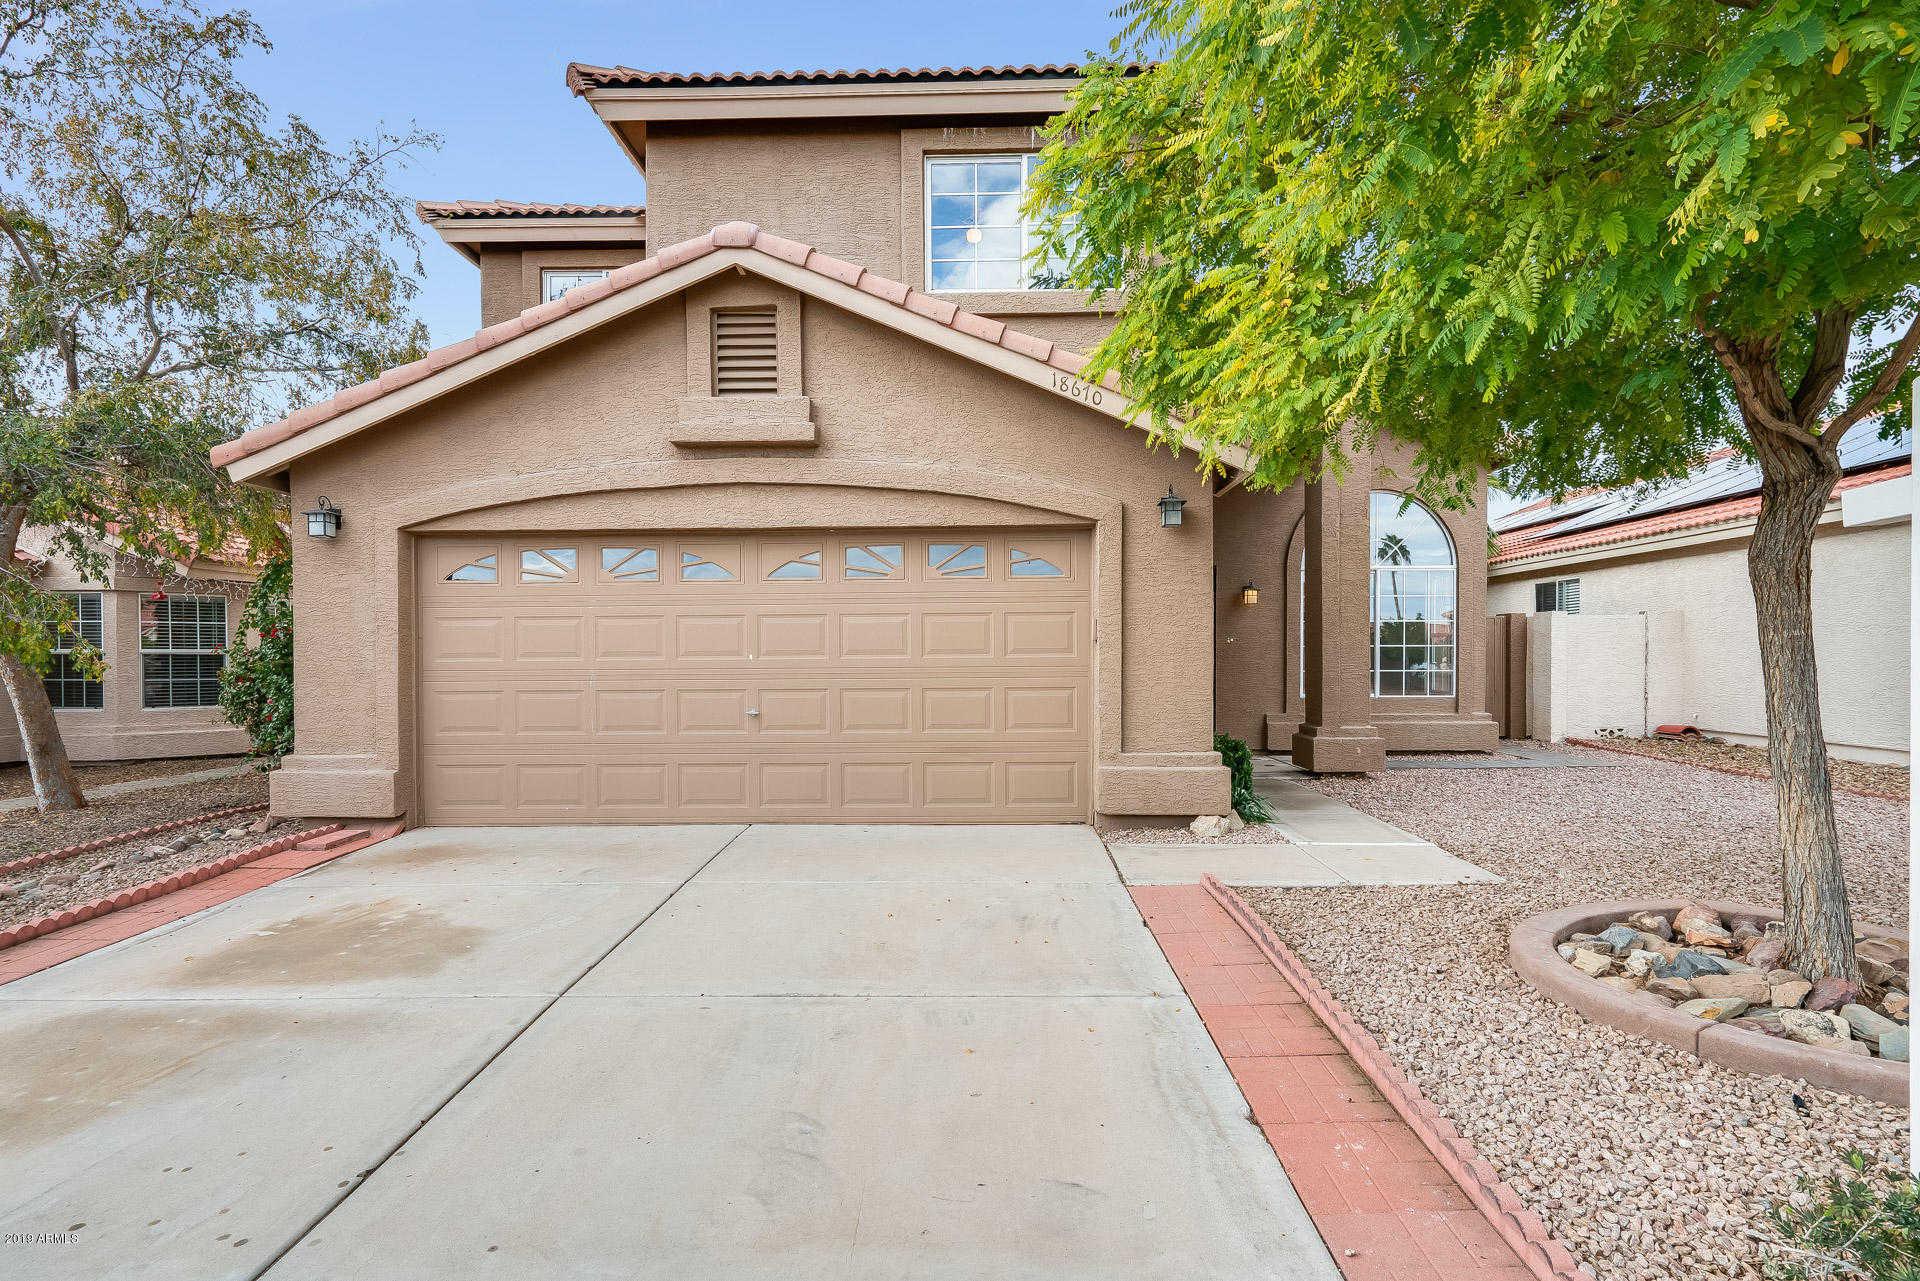 $299,900 - 4Br/3Ba - Home for Sale in Arrowhead Ranch 12 Amd Lt 1-170 Tr A-c, Glendale